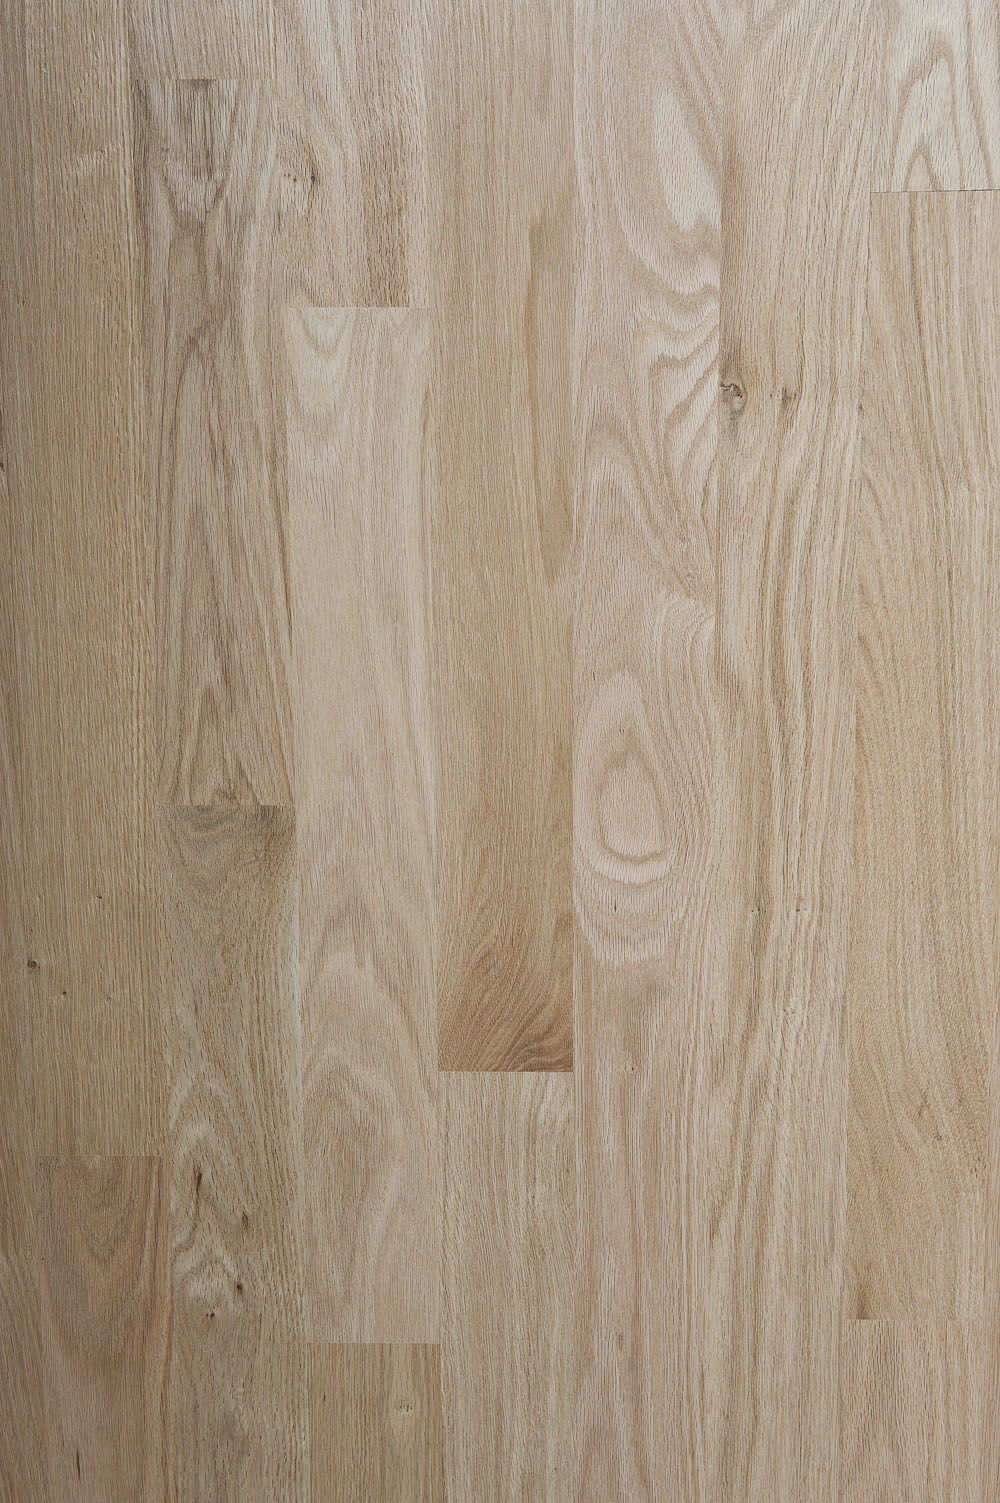 Northern Red Oak Species Page